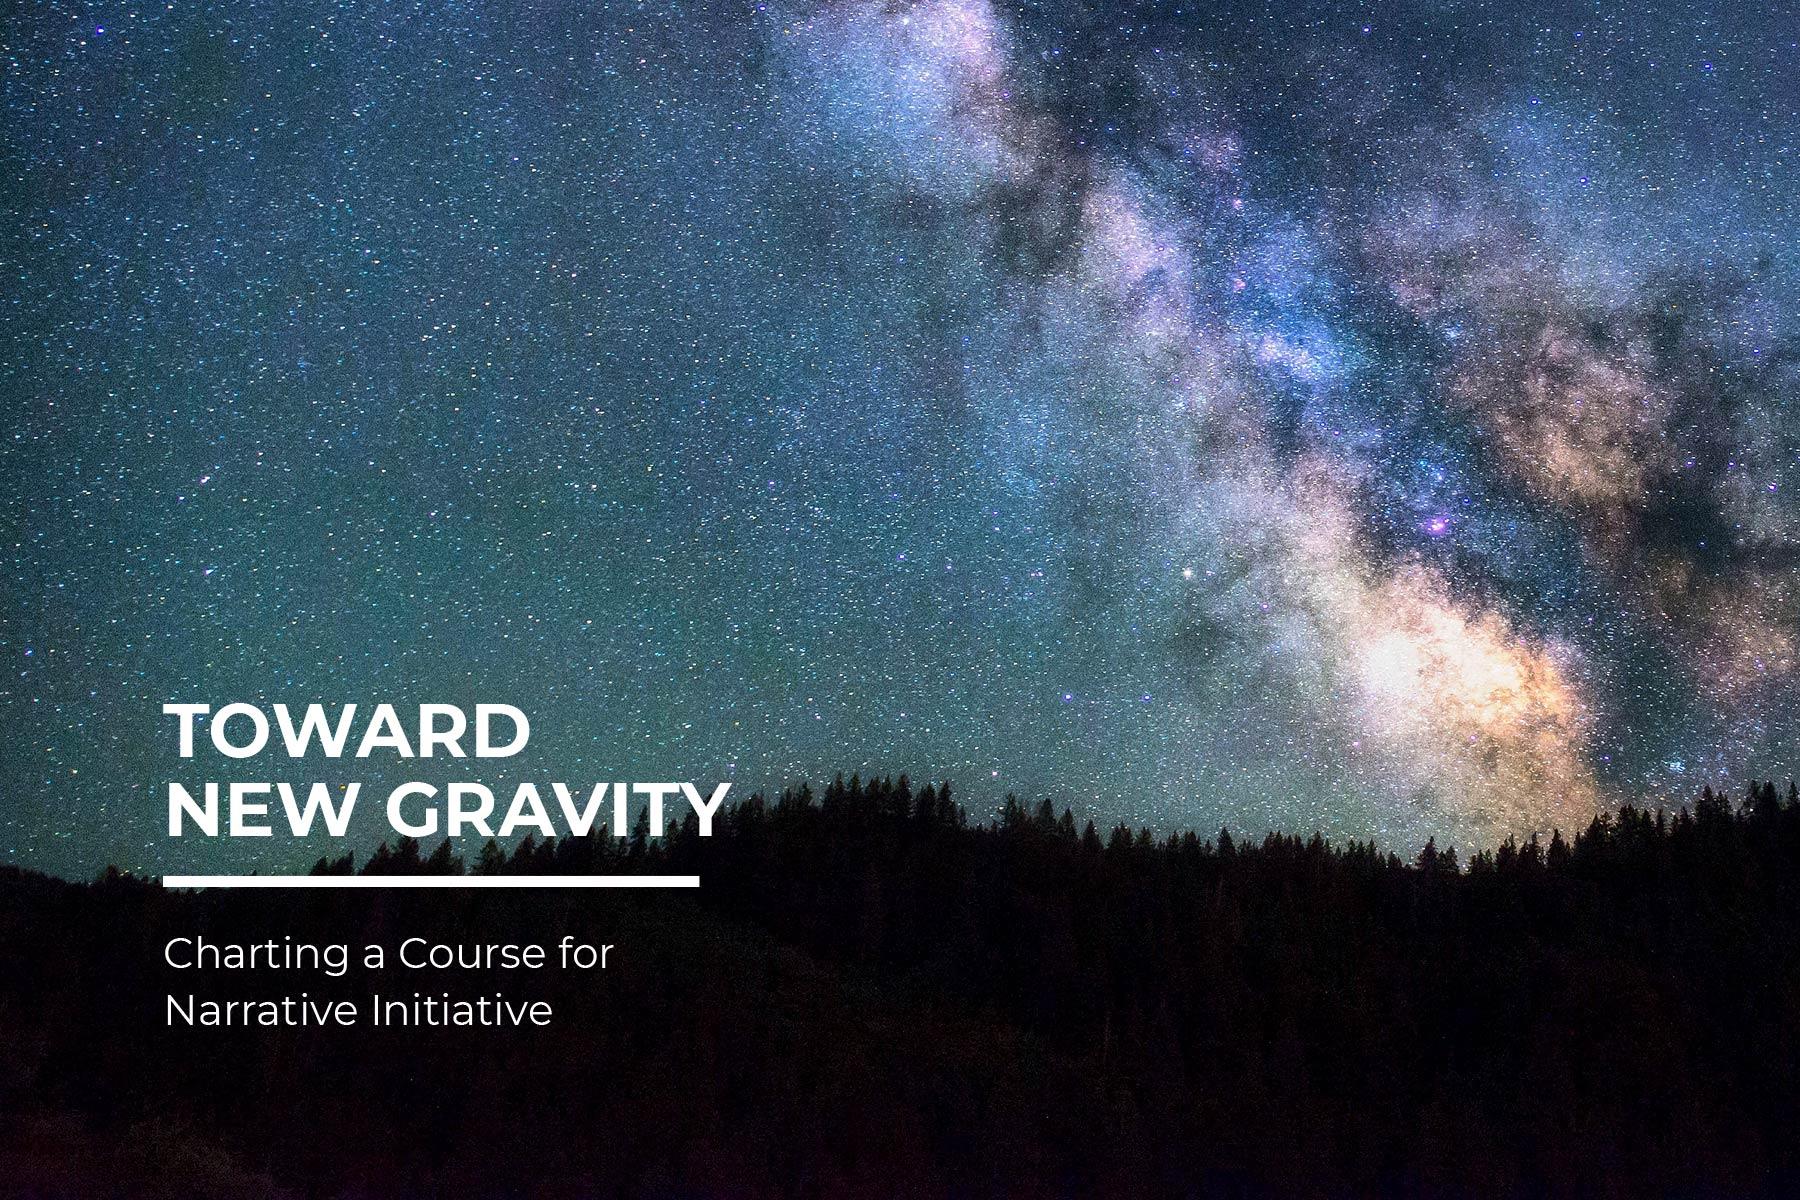 Toward New Gravity